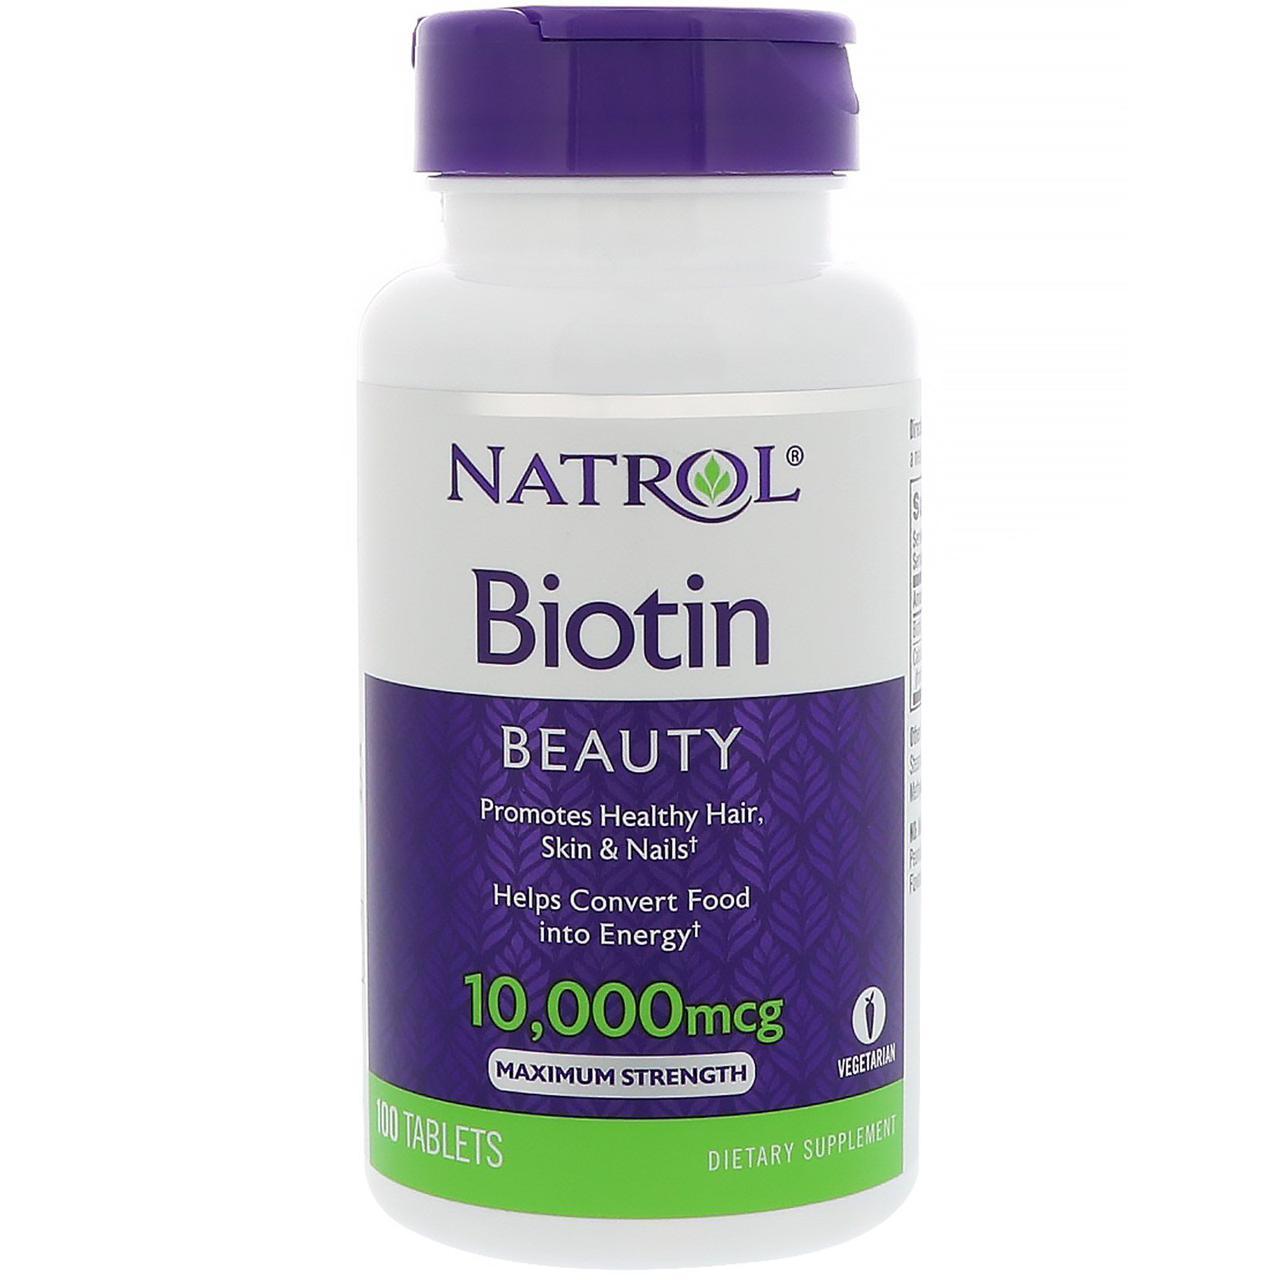 Natrol Biotin 10,000 mcg 100 tabs